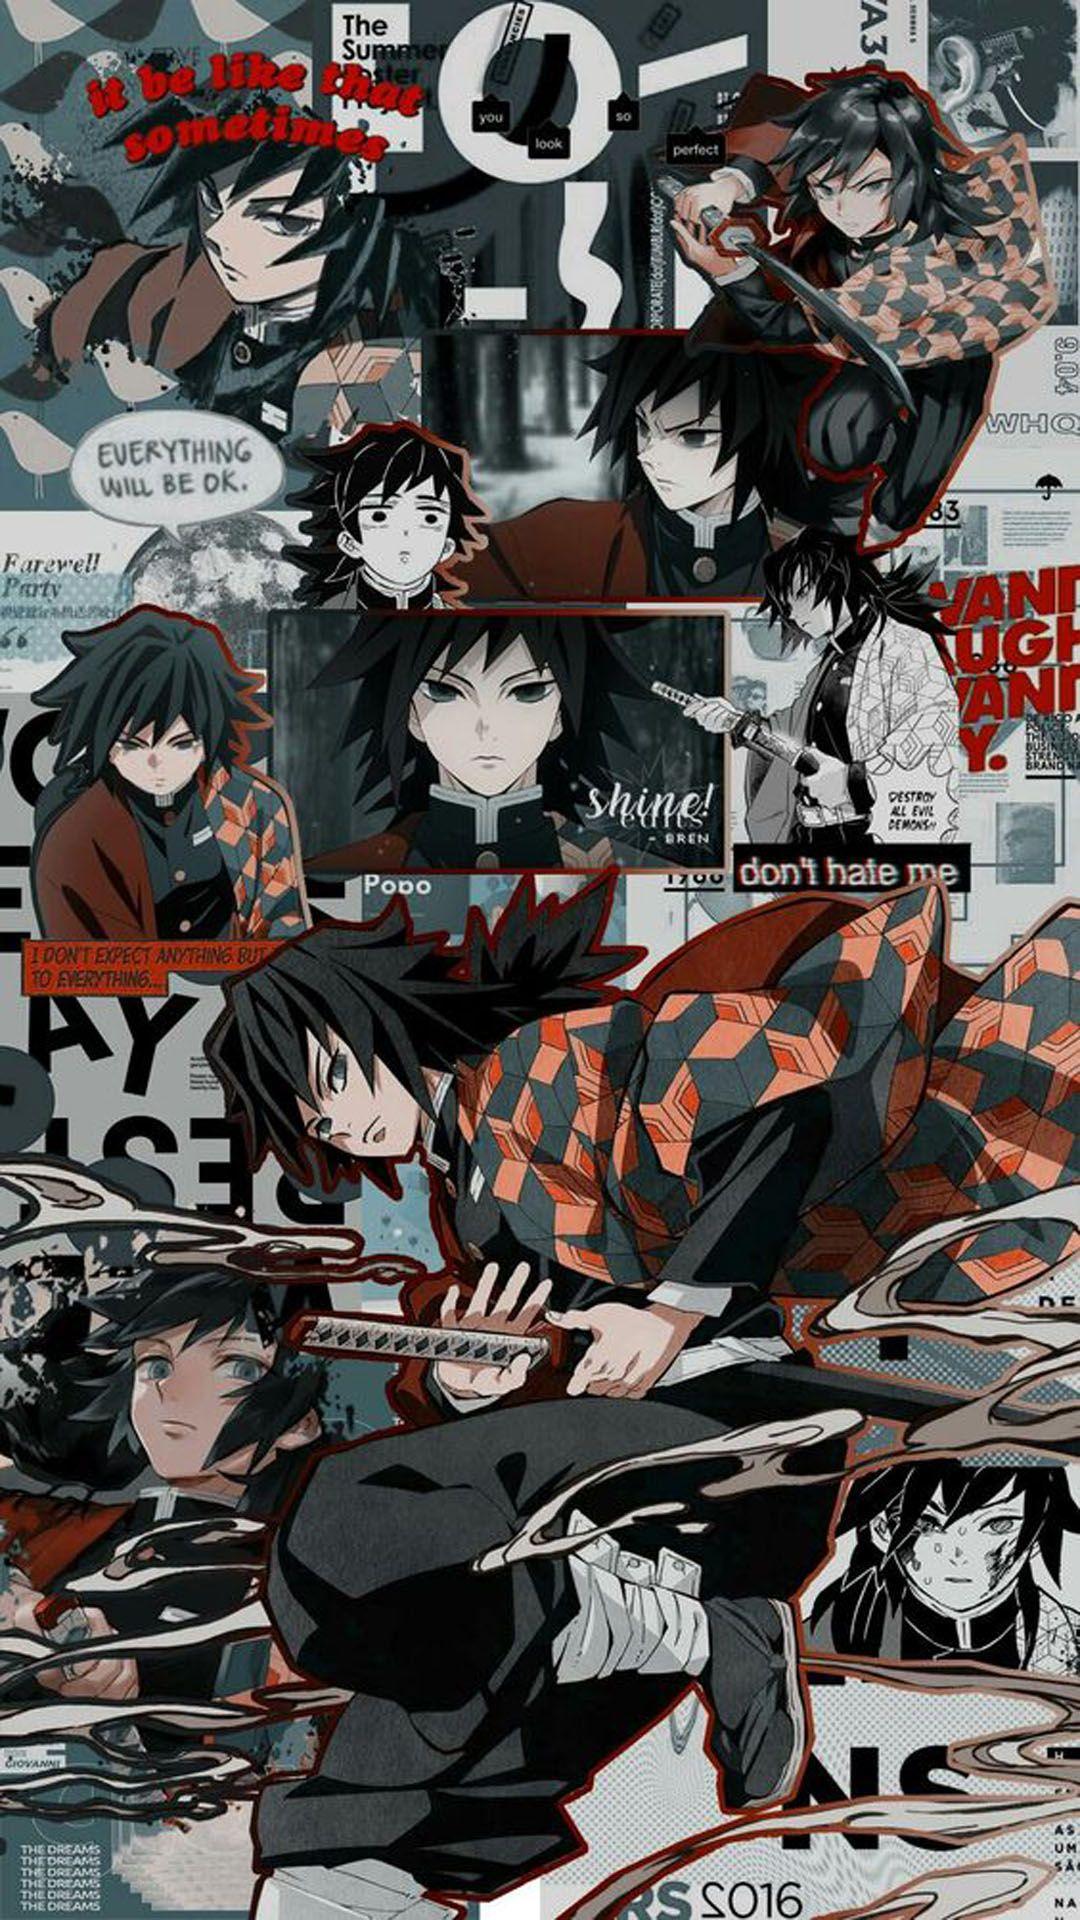 Demonslayer Giyu Tomioka Ilustrasi Karakter Seni Siluet Manga Anime Demon slayer anime phone wallpaper